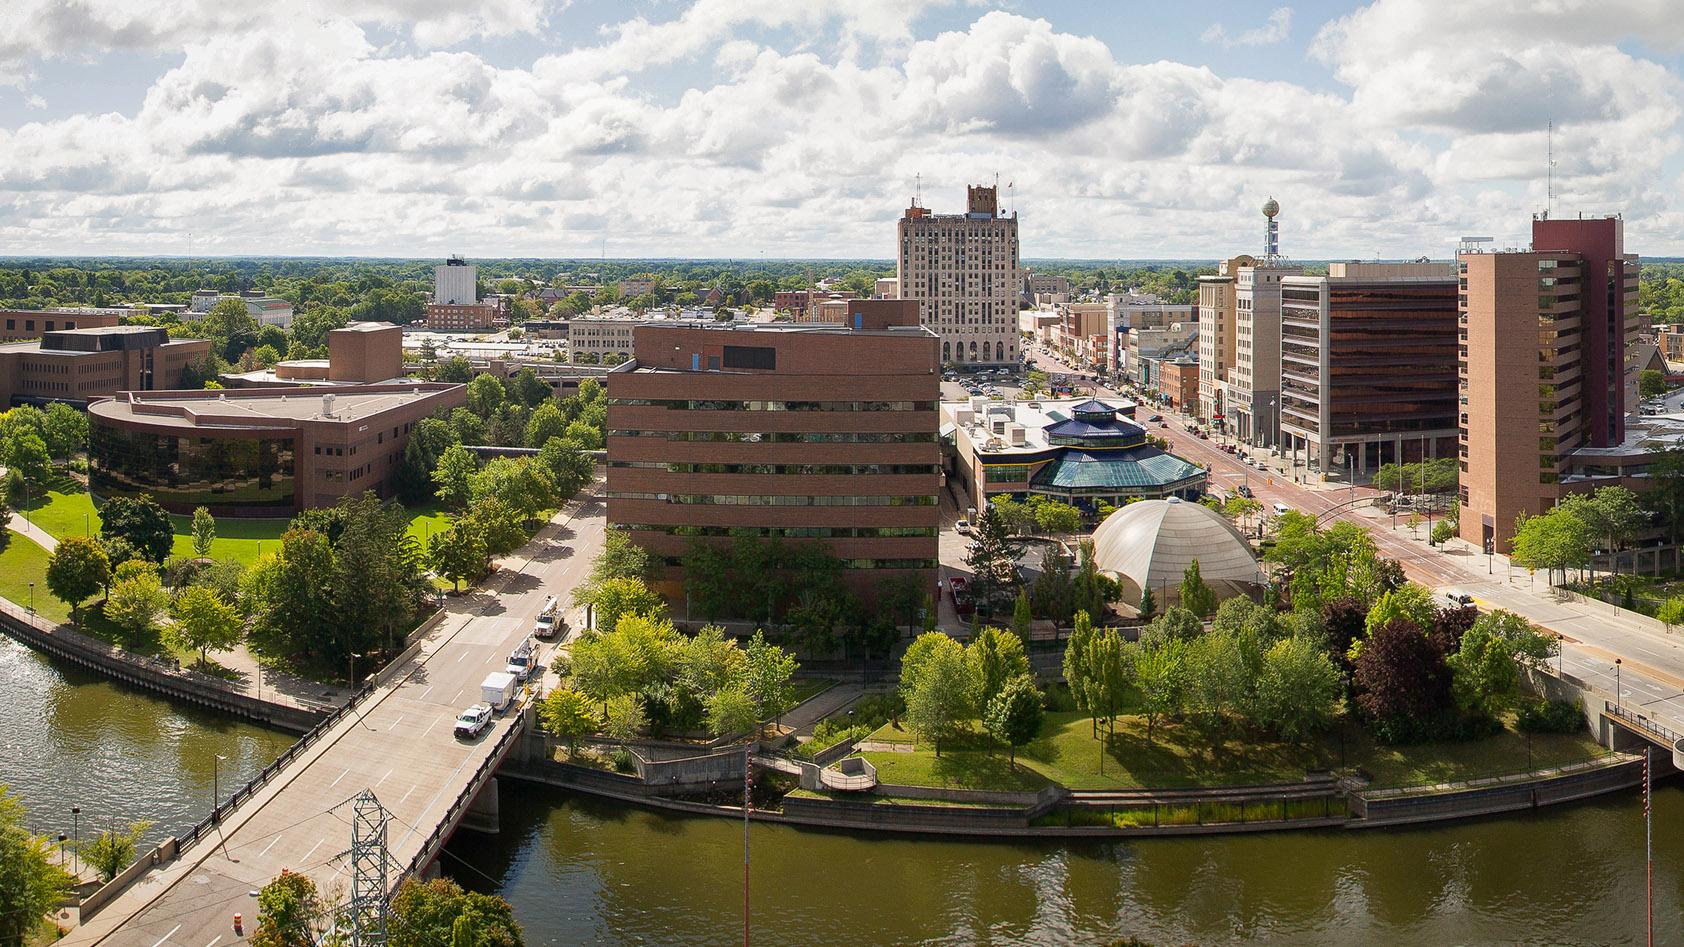 Skyline showing the University of Michigan-Flint campus